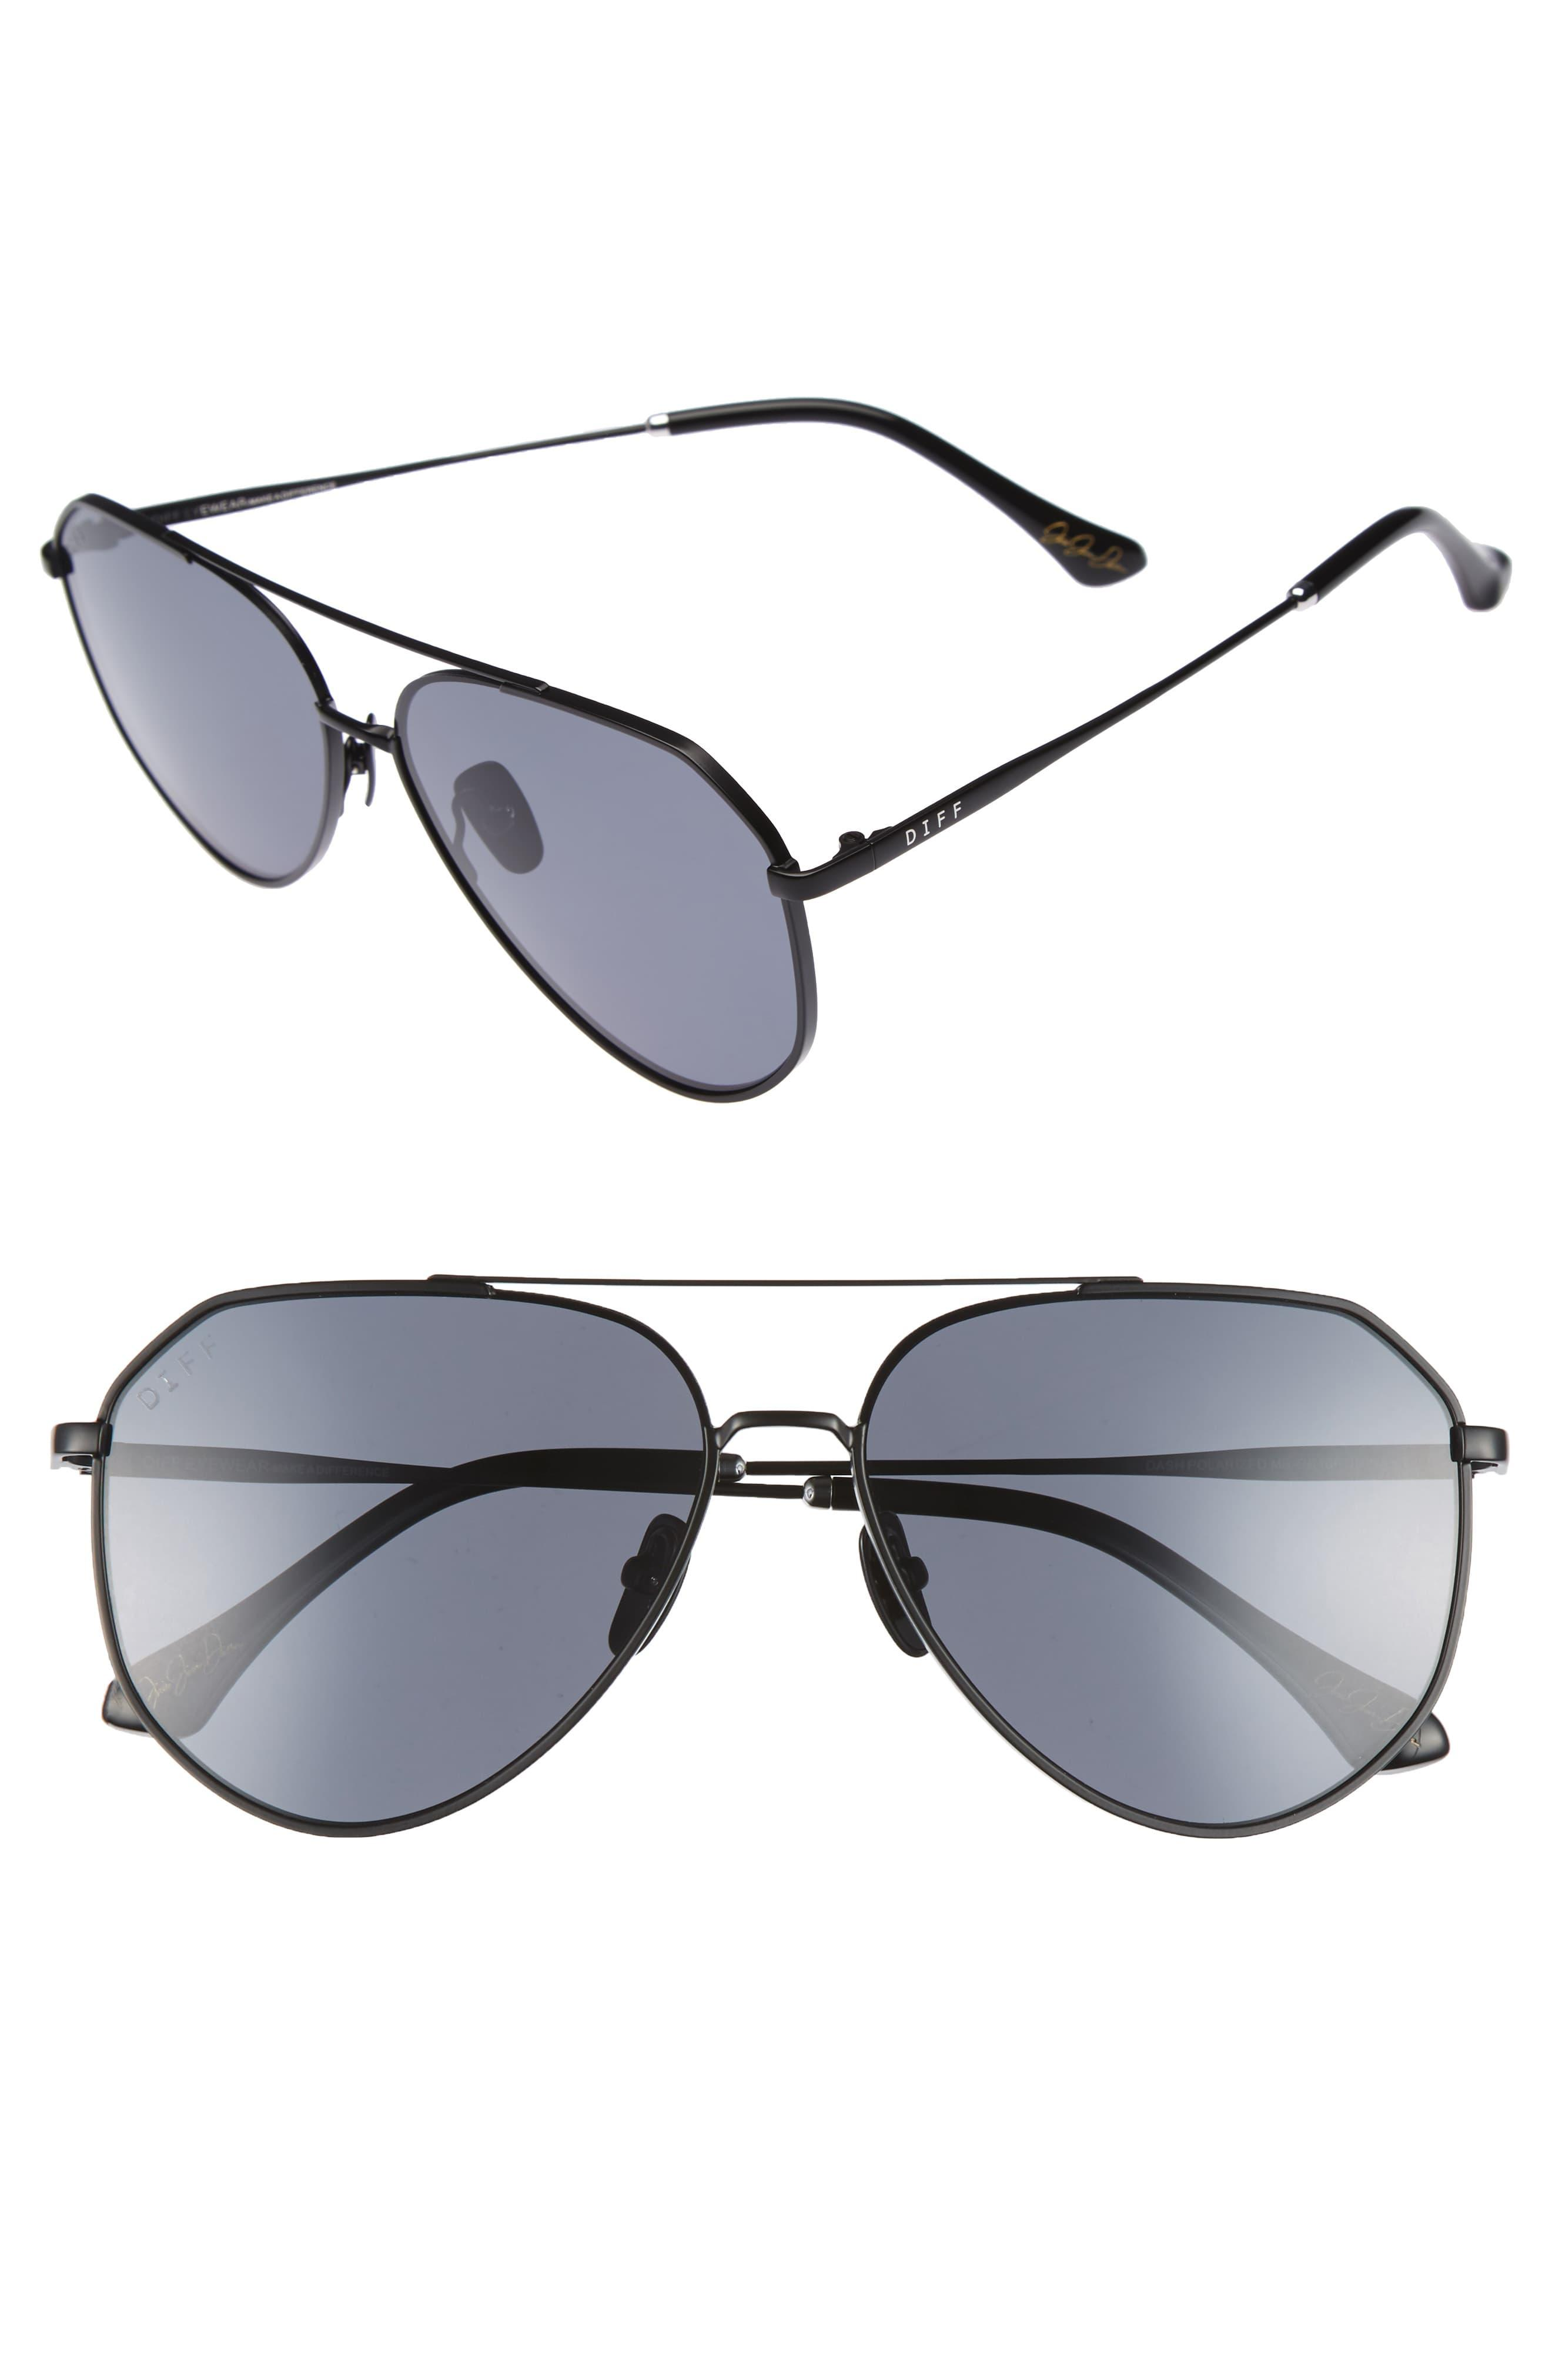 678332a8be6c DIFF X Jessie James Decker Dash 61mm Polarized Aviator Sunglasses ...